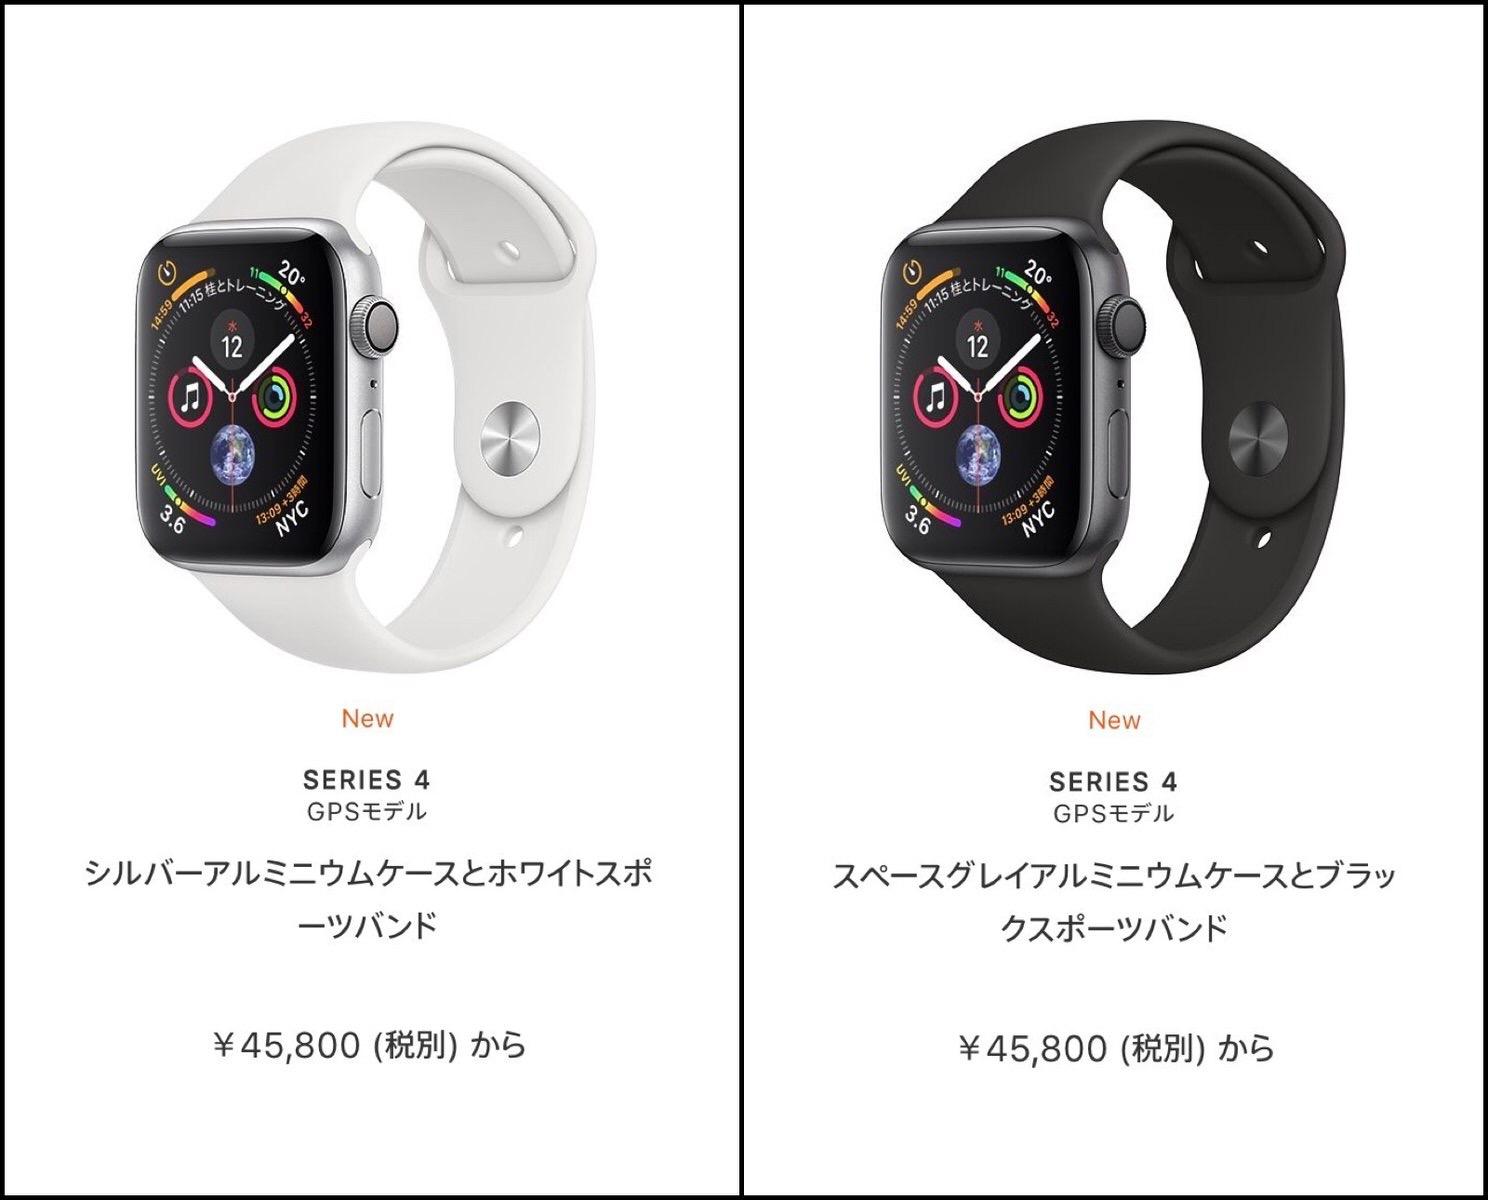 [Apple Watch]現役バリバリの愛機である初代 Apple Watch Series 1 のApple GiveBack(下取り価格)を調べてみたよ